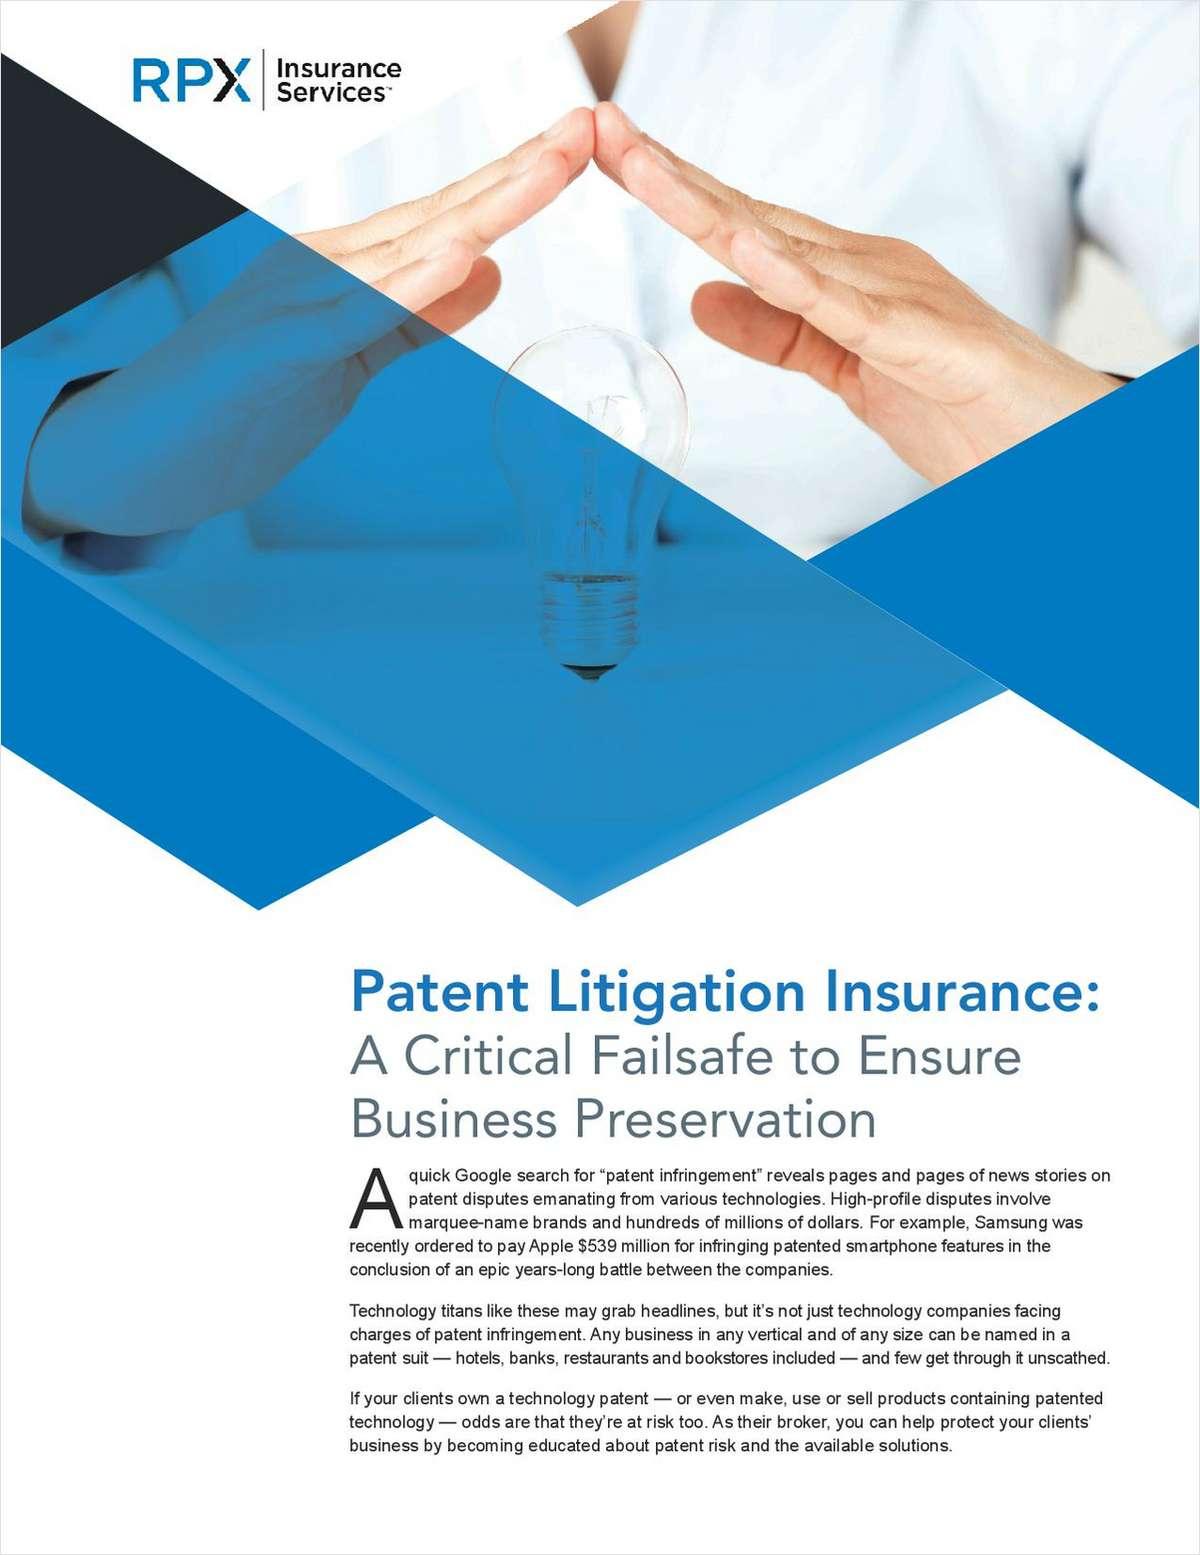 Patent Litigation Insurance: A Critical Failsafe to Ensure Business Preservation